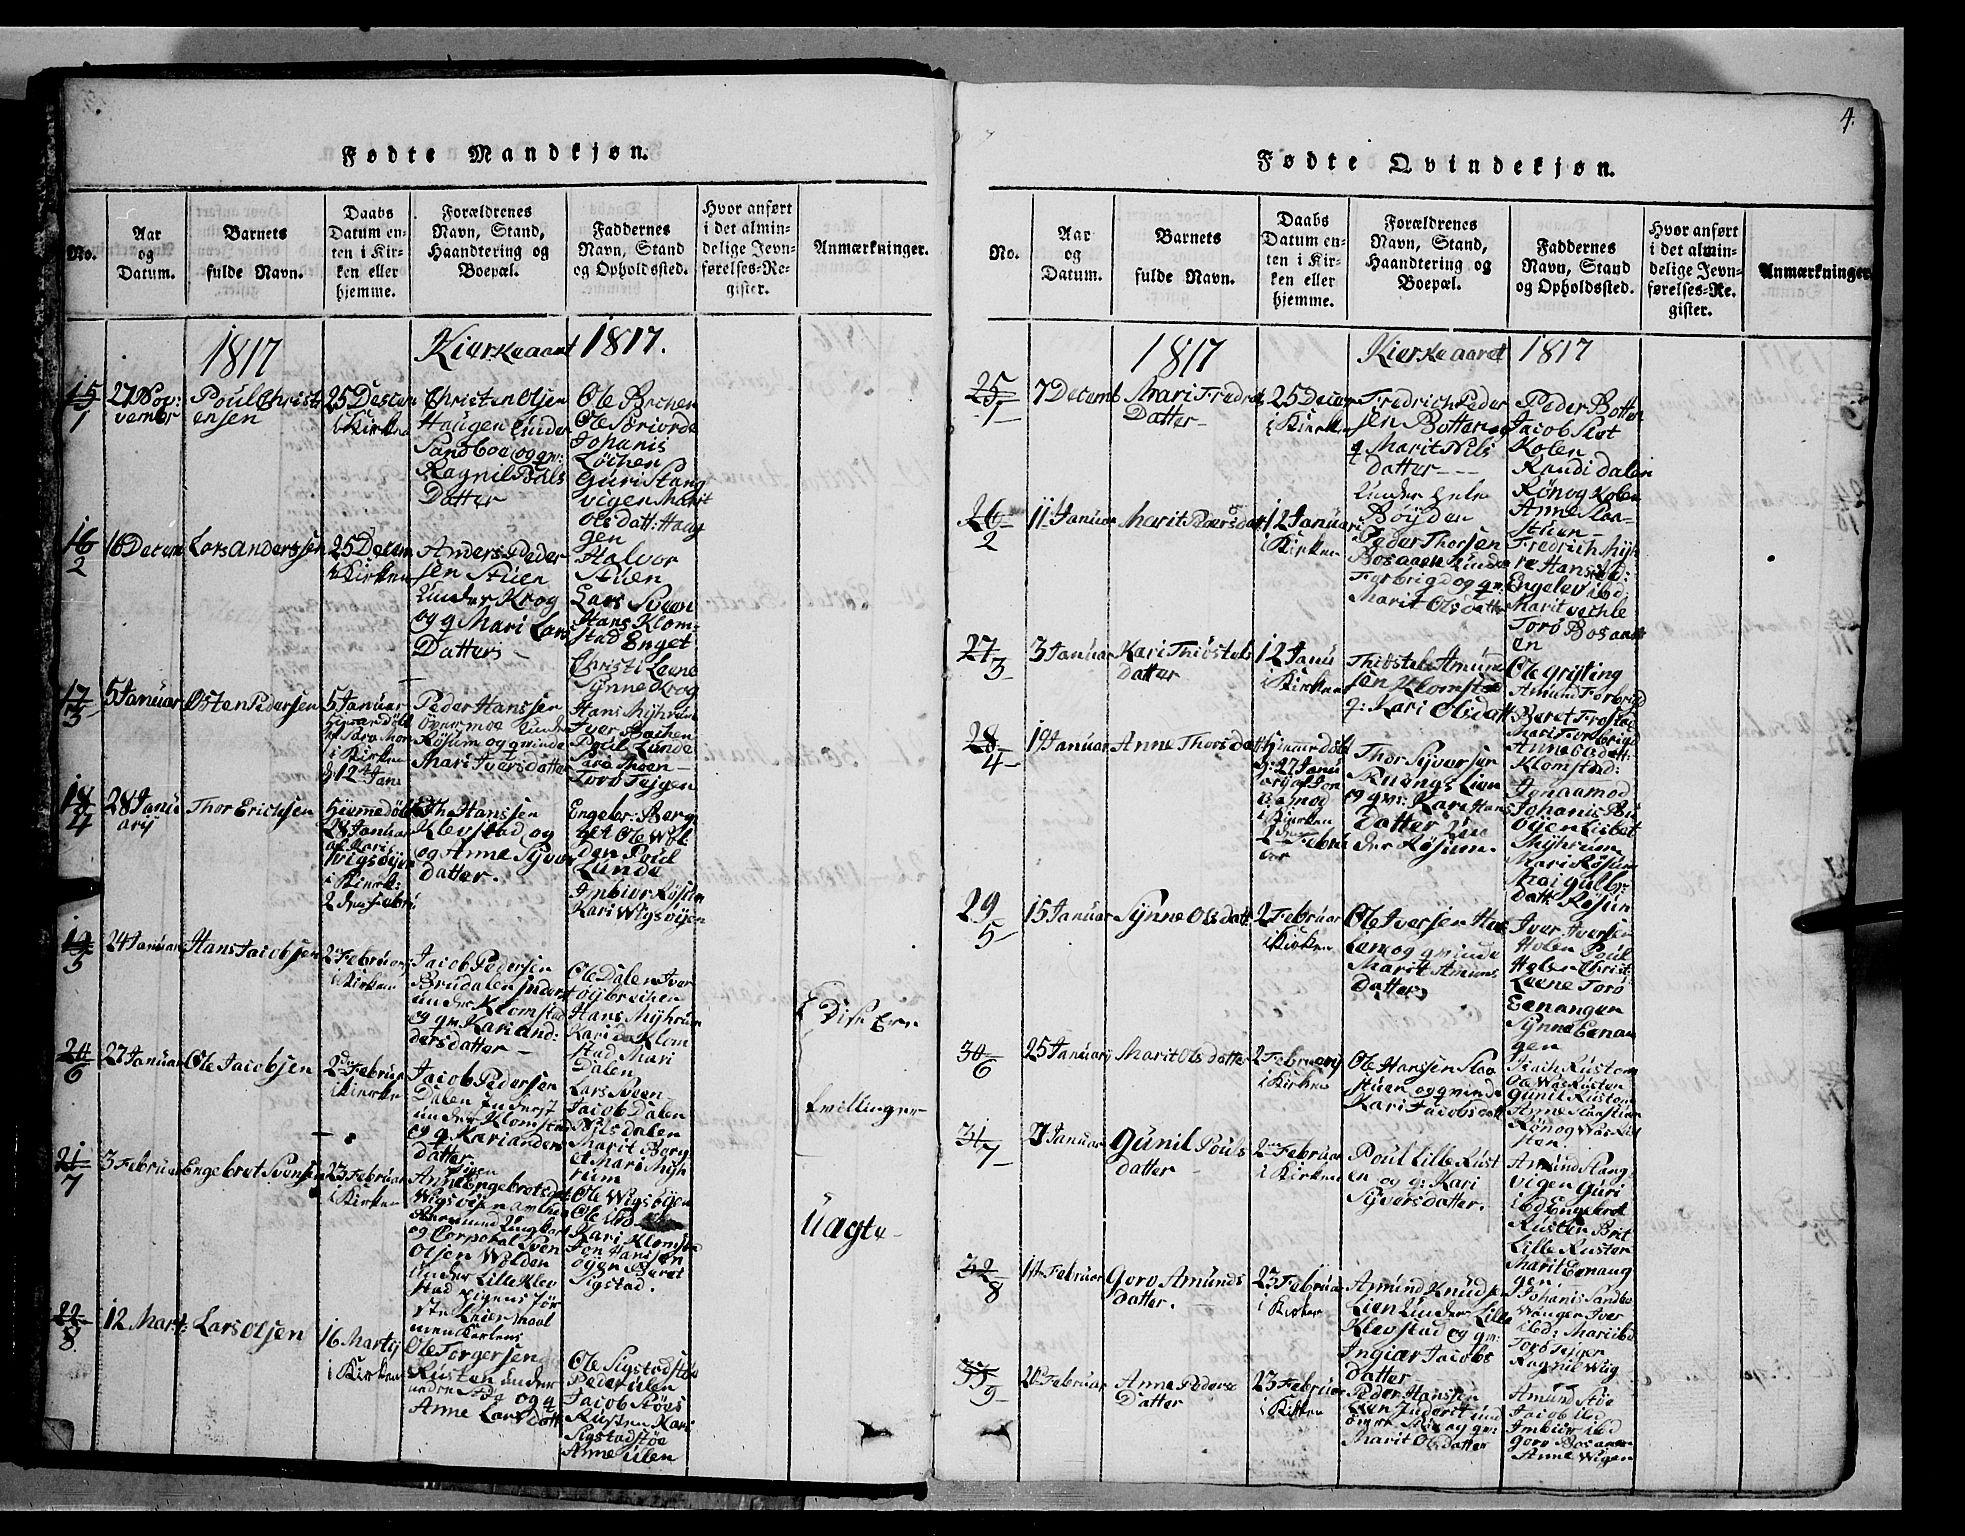 SAH, Fron prestekontor, H/Ha/Hab/L0002: Klokkerbok nr. 2, 1816-1850, s. 4